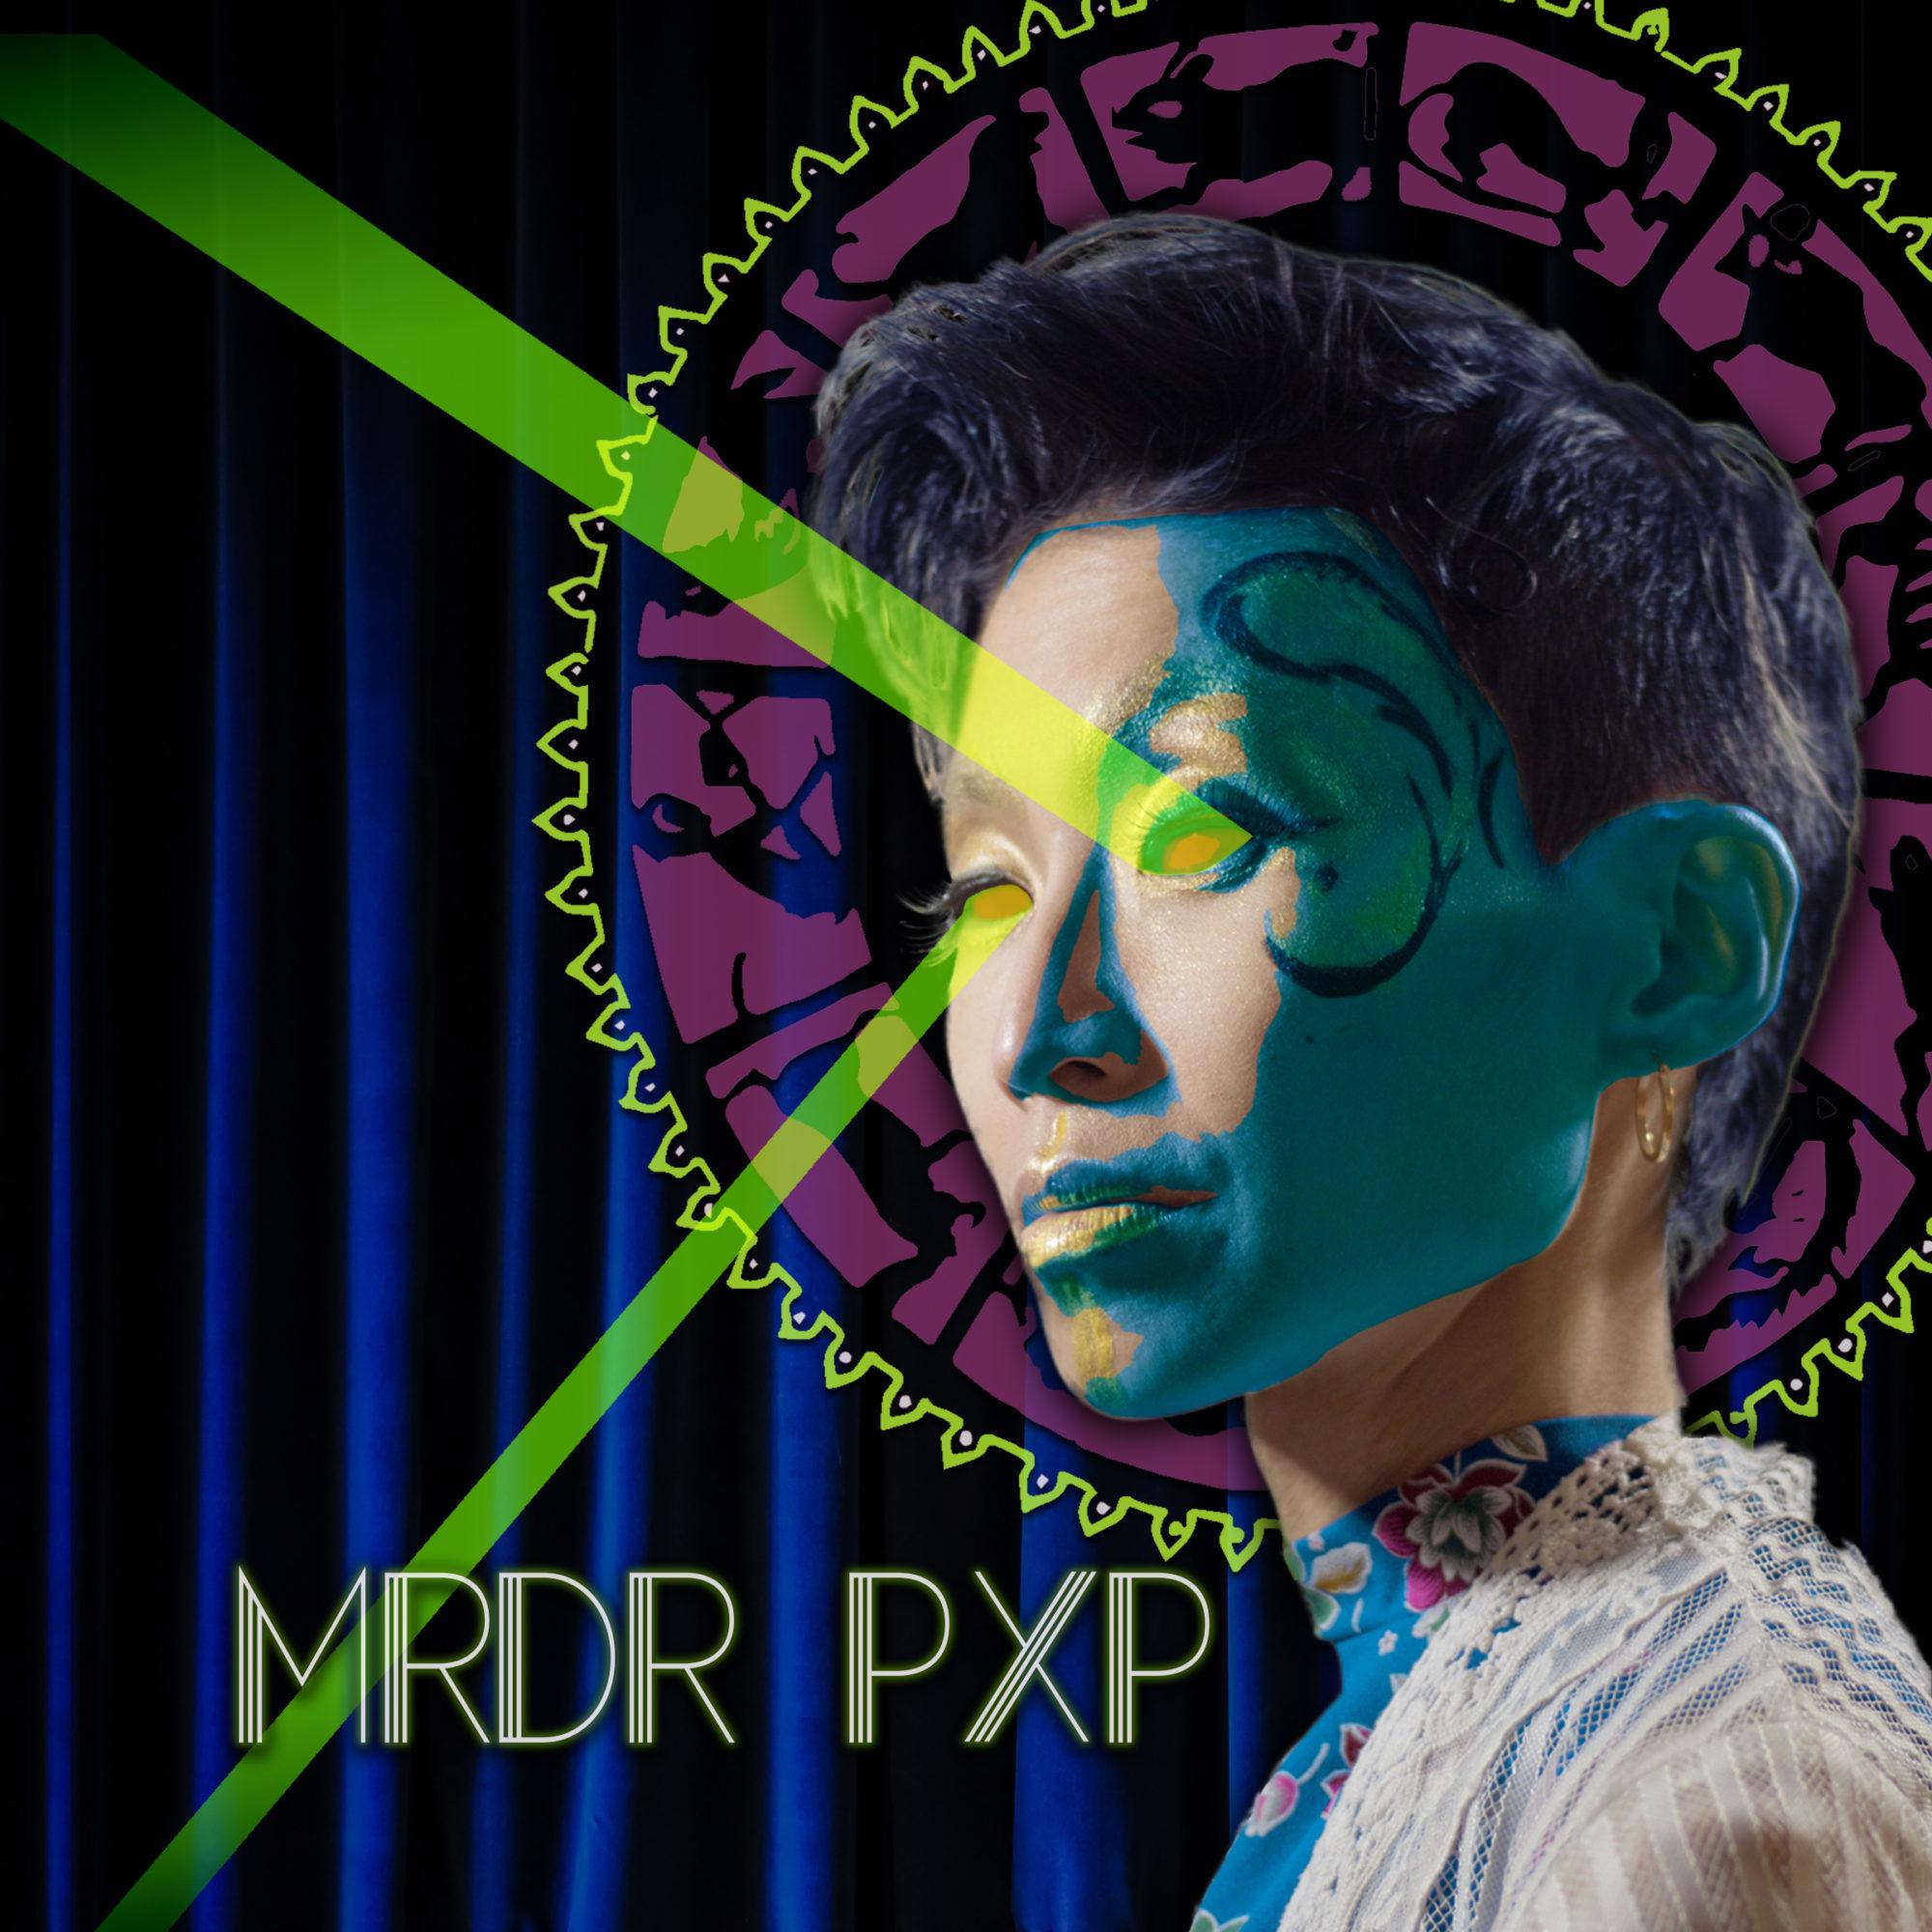 Caption: Mayda's new album is called MRDR PXP., Credit: Cameron Yang, Styling by: Oskar Ly, Editing: by Sara Beth-Horishnyk.